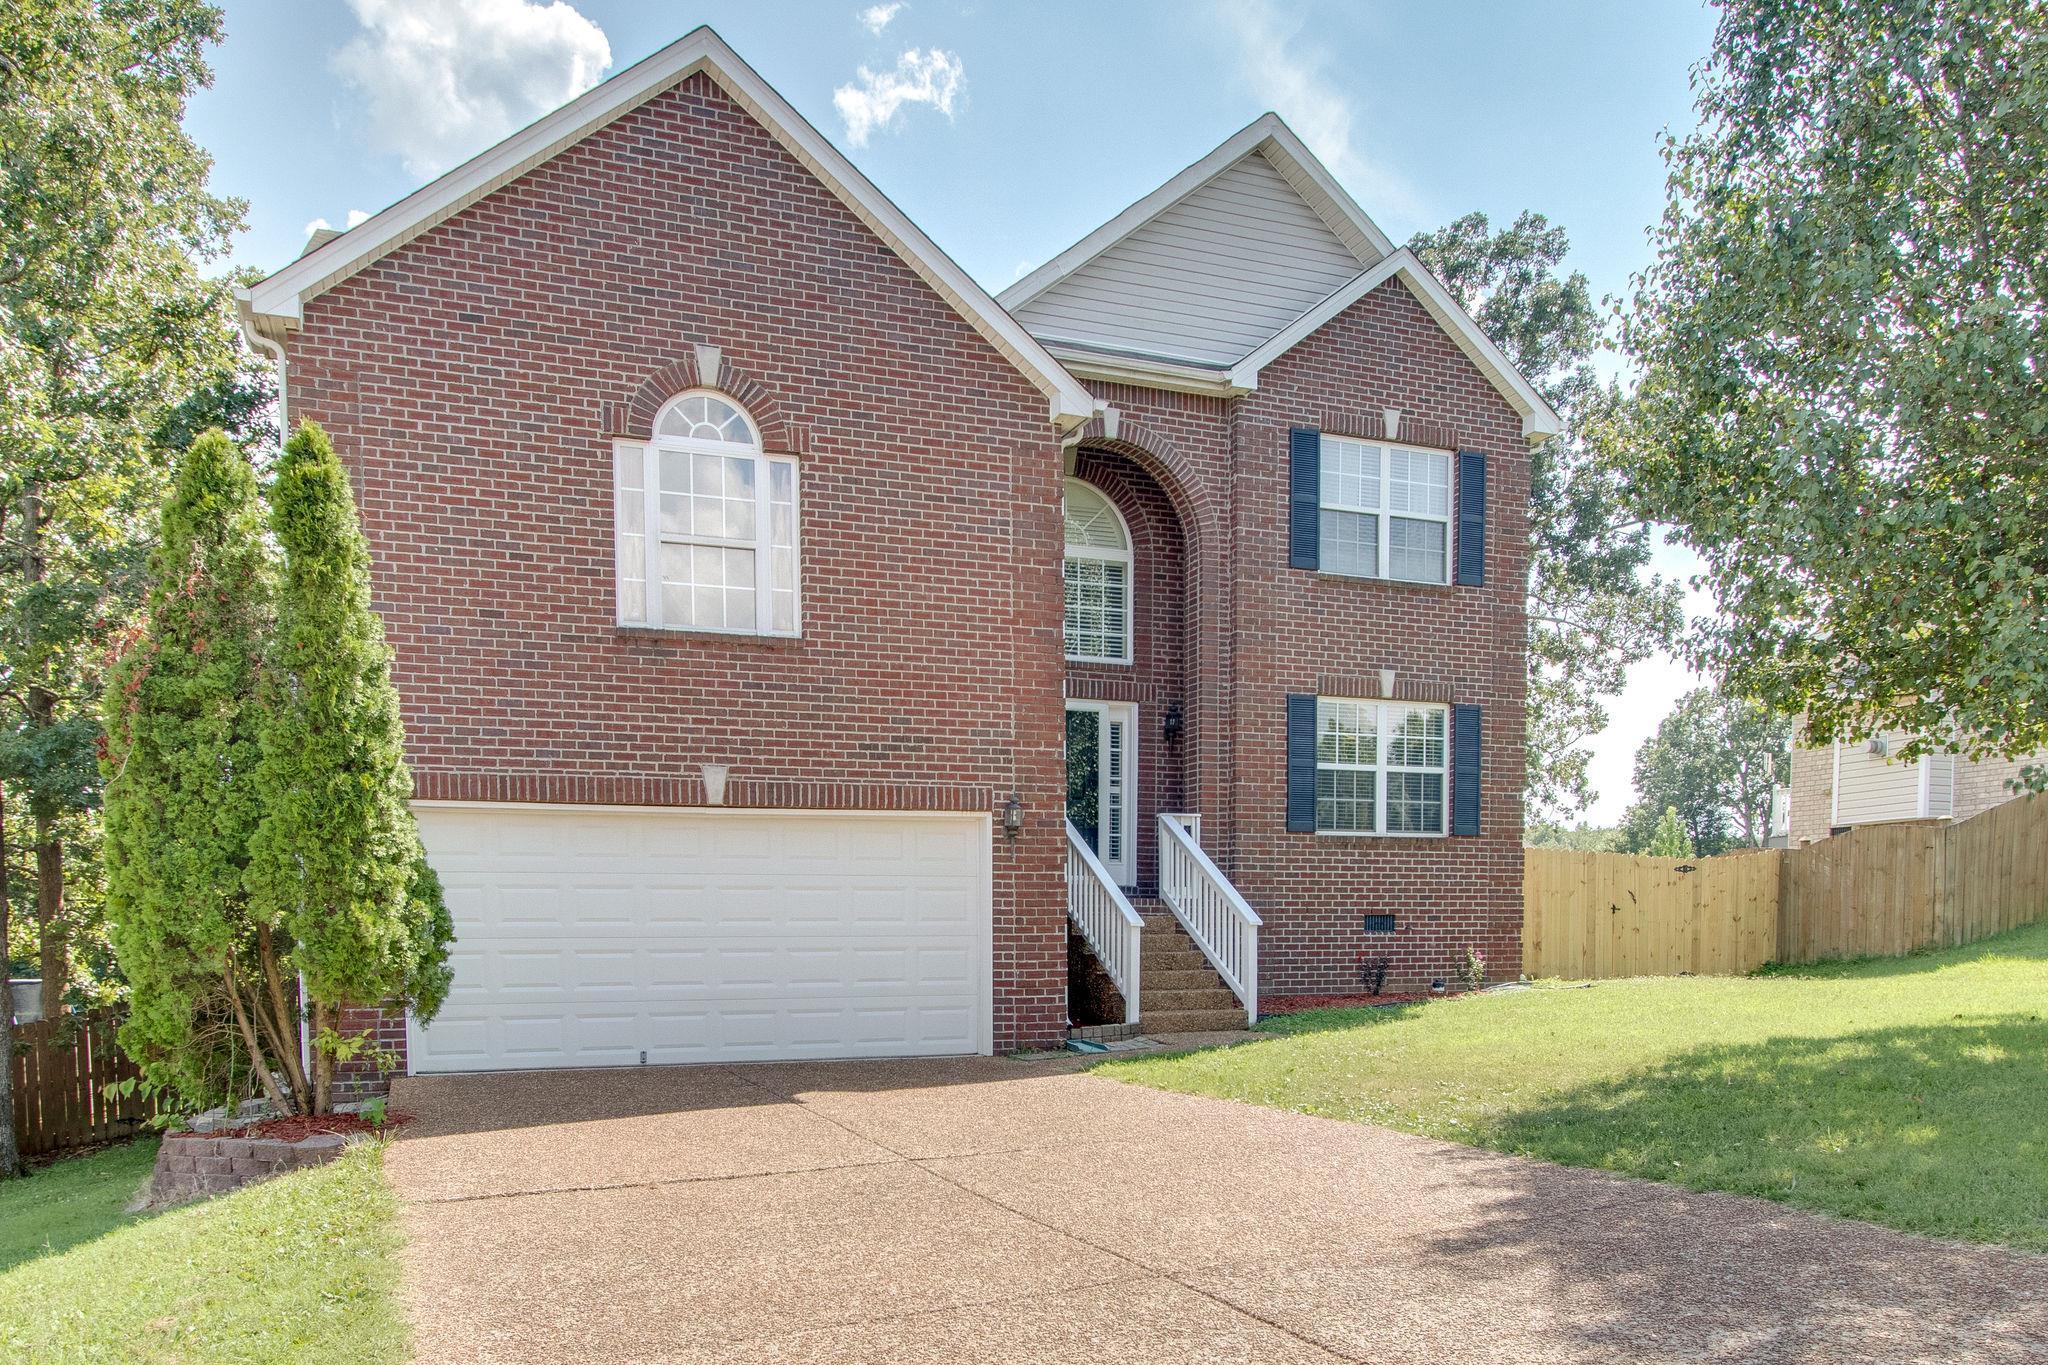 7026 Timber Oak Dr, Mount Juliet, TN 37122 - Mount Juliet, TN real estate listing